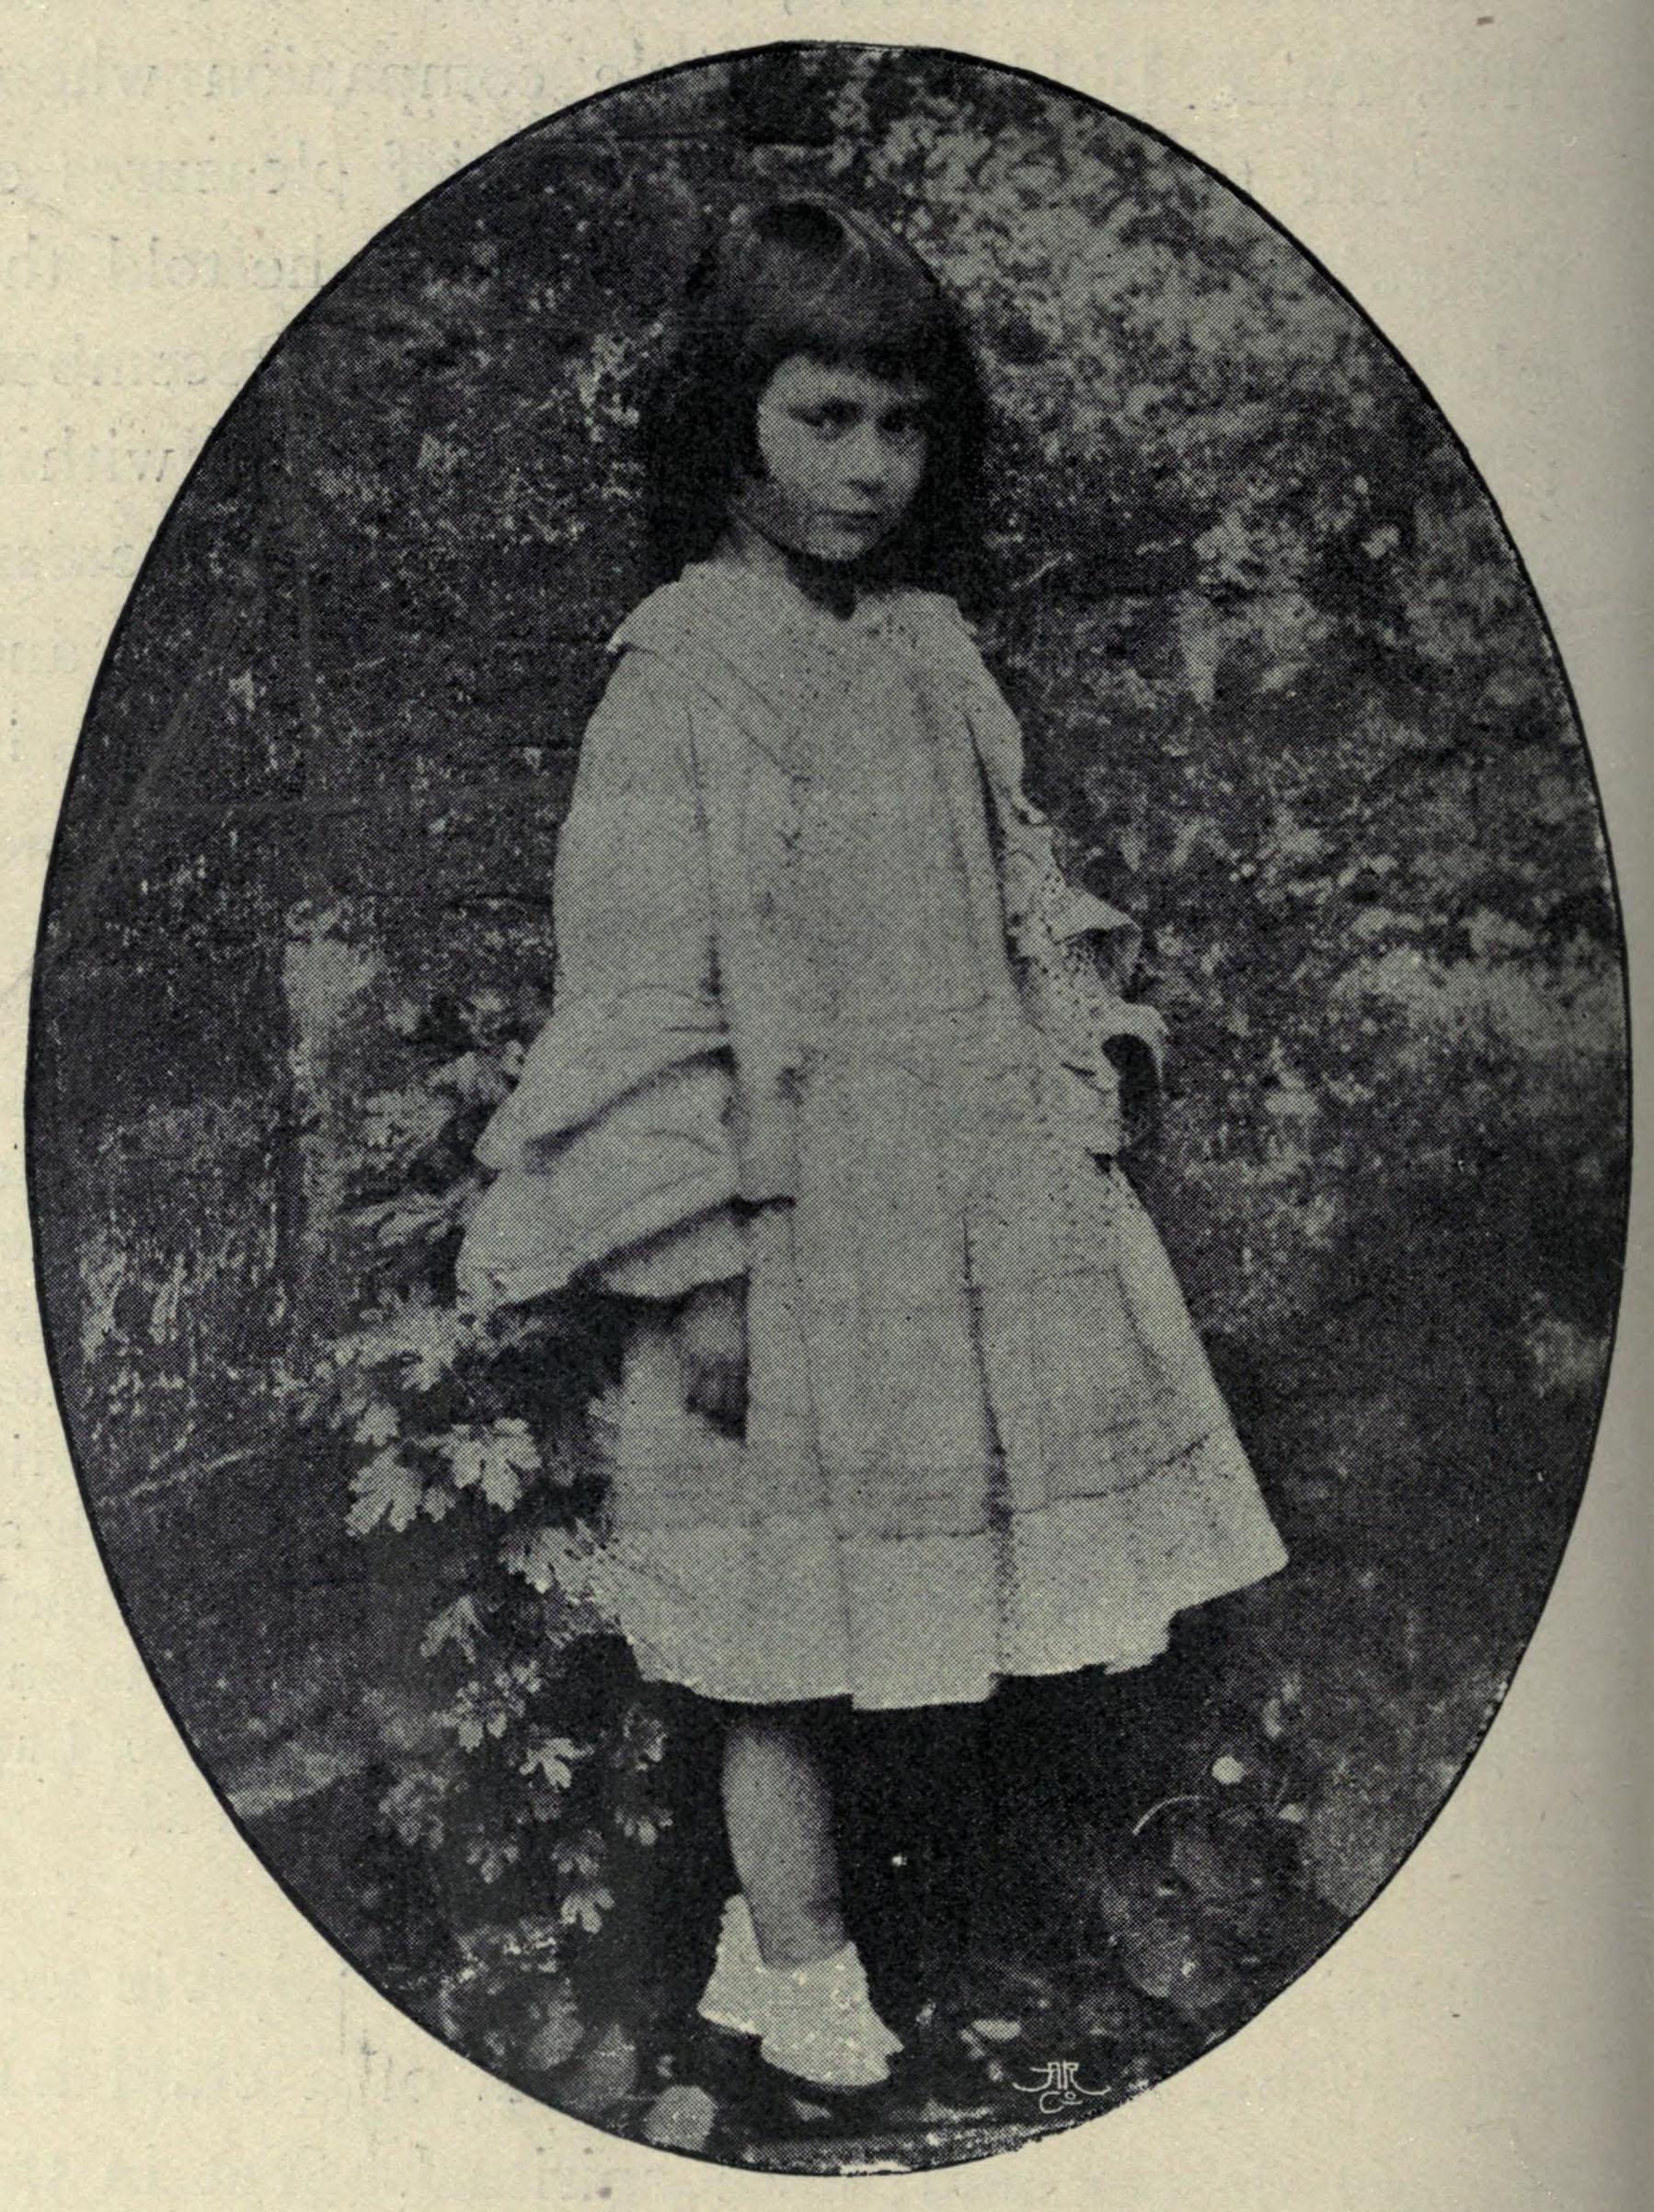 http://upload.wikimedia.org/wikipedia/commons/0/08/Alice_Liddell_by_Lewis_Carroll.jpg